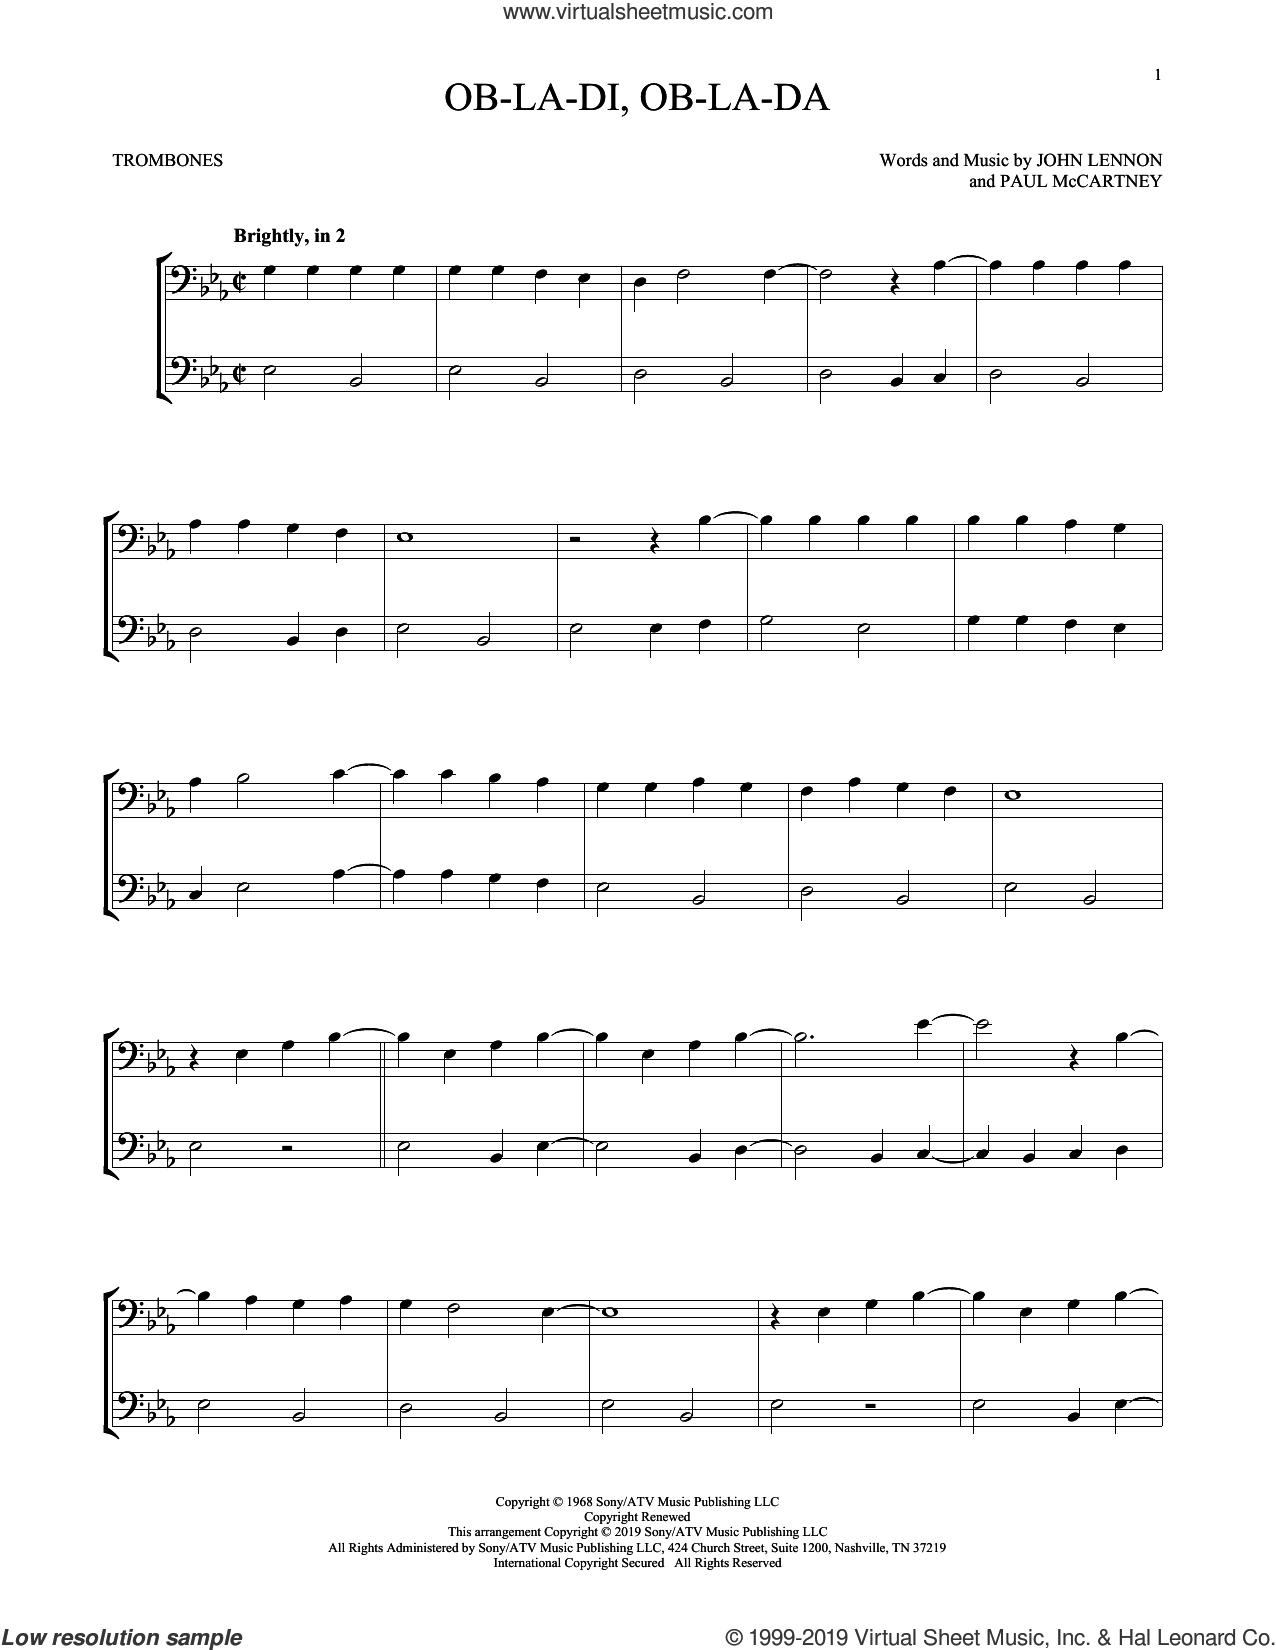 Ob-La-Di, Ob-La-Da sheet music for two trombones (duet, duets) by The Beatles, John Lennon and Paul McCartney, intermediate skill level